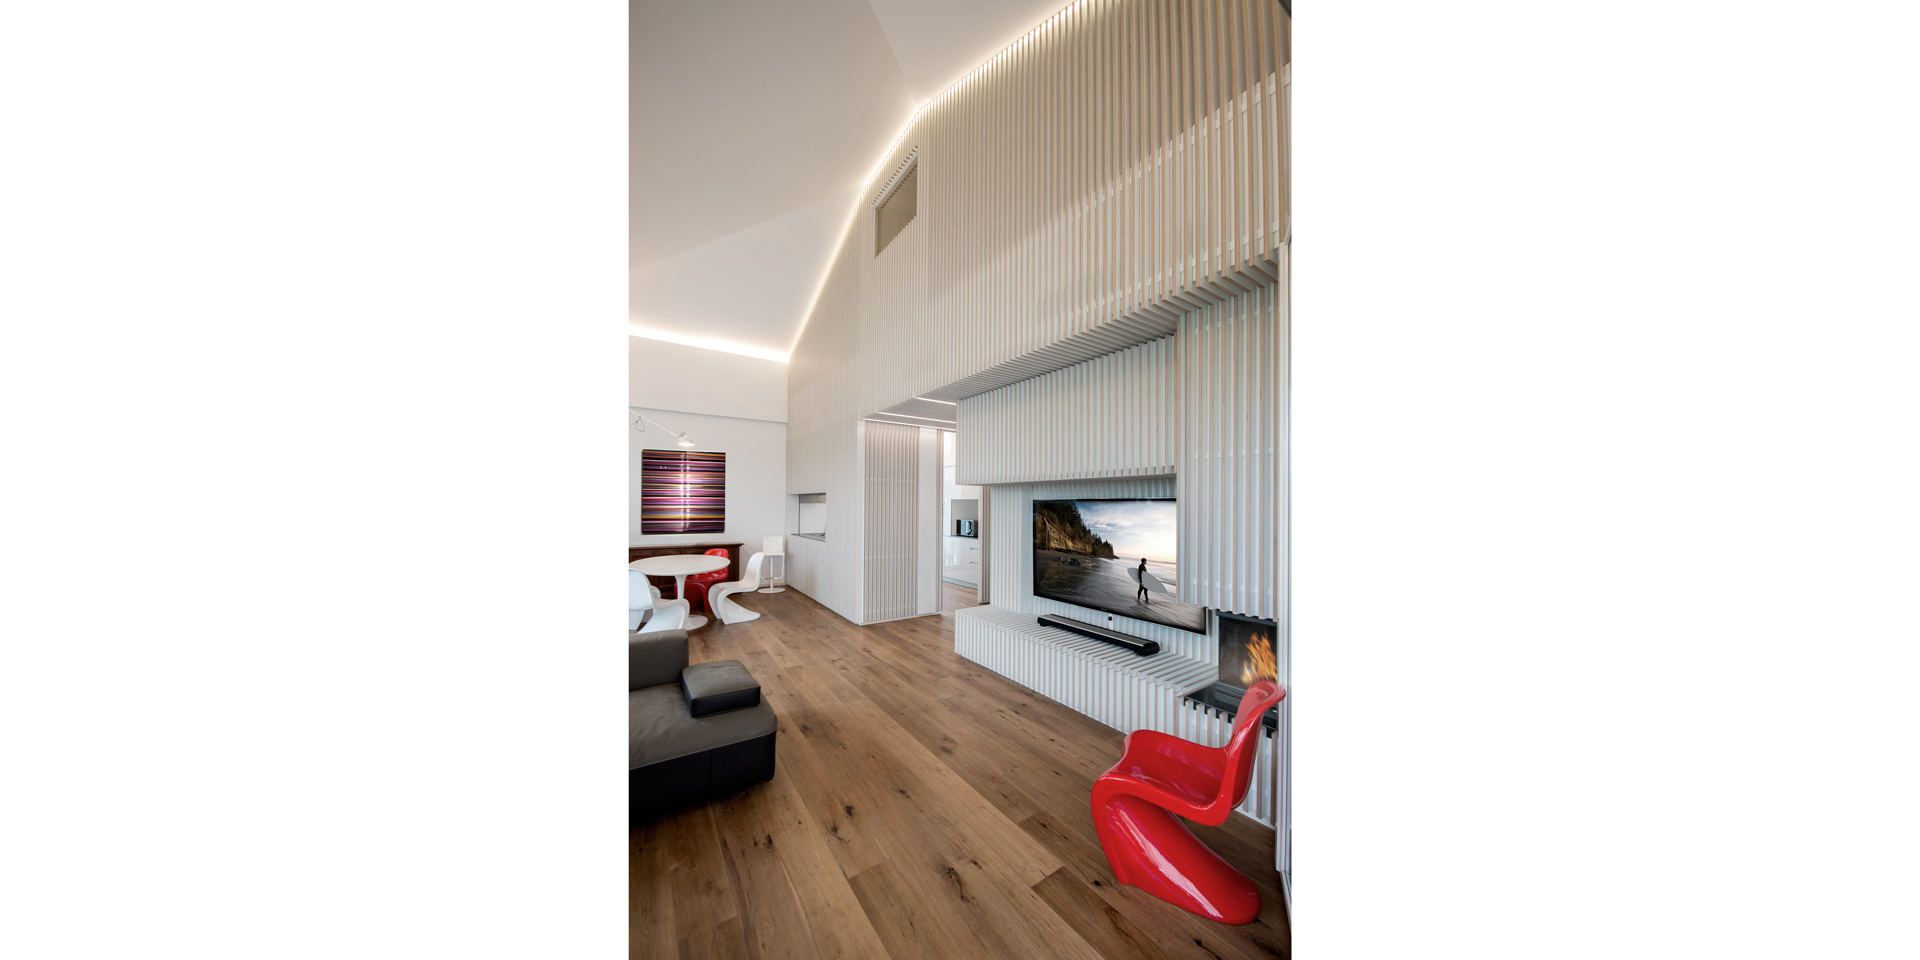 archinow_BVR_-residenza-privata-03